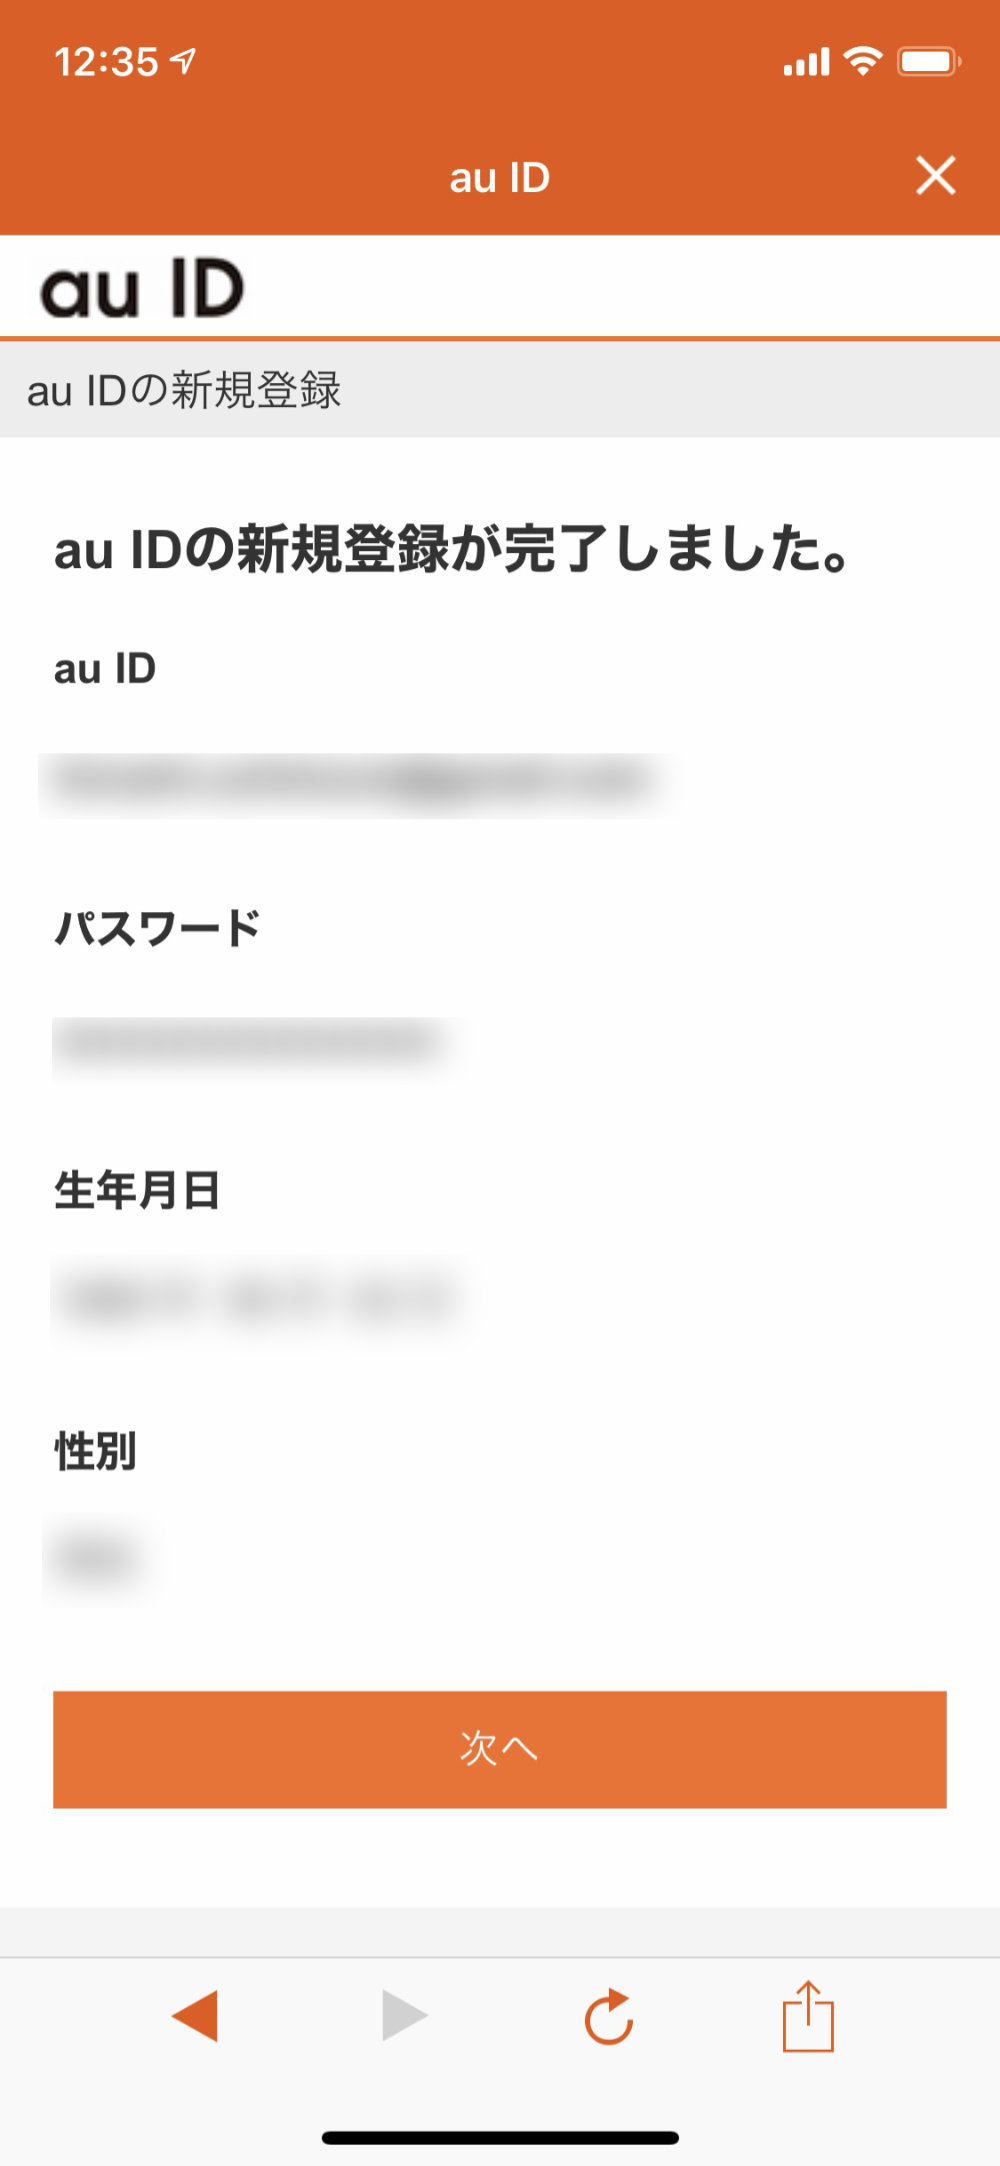 au ID新規登録完了